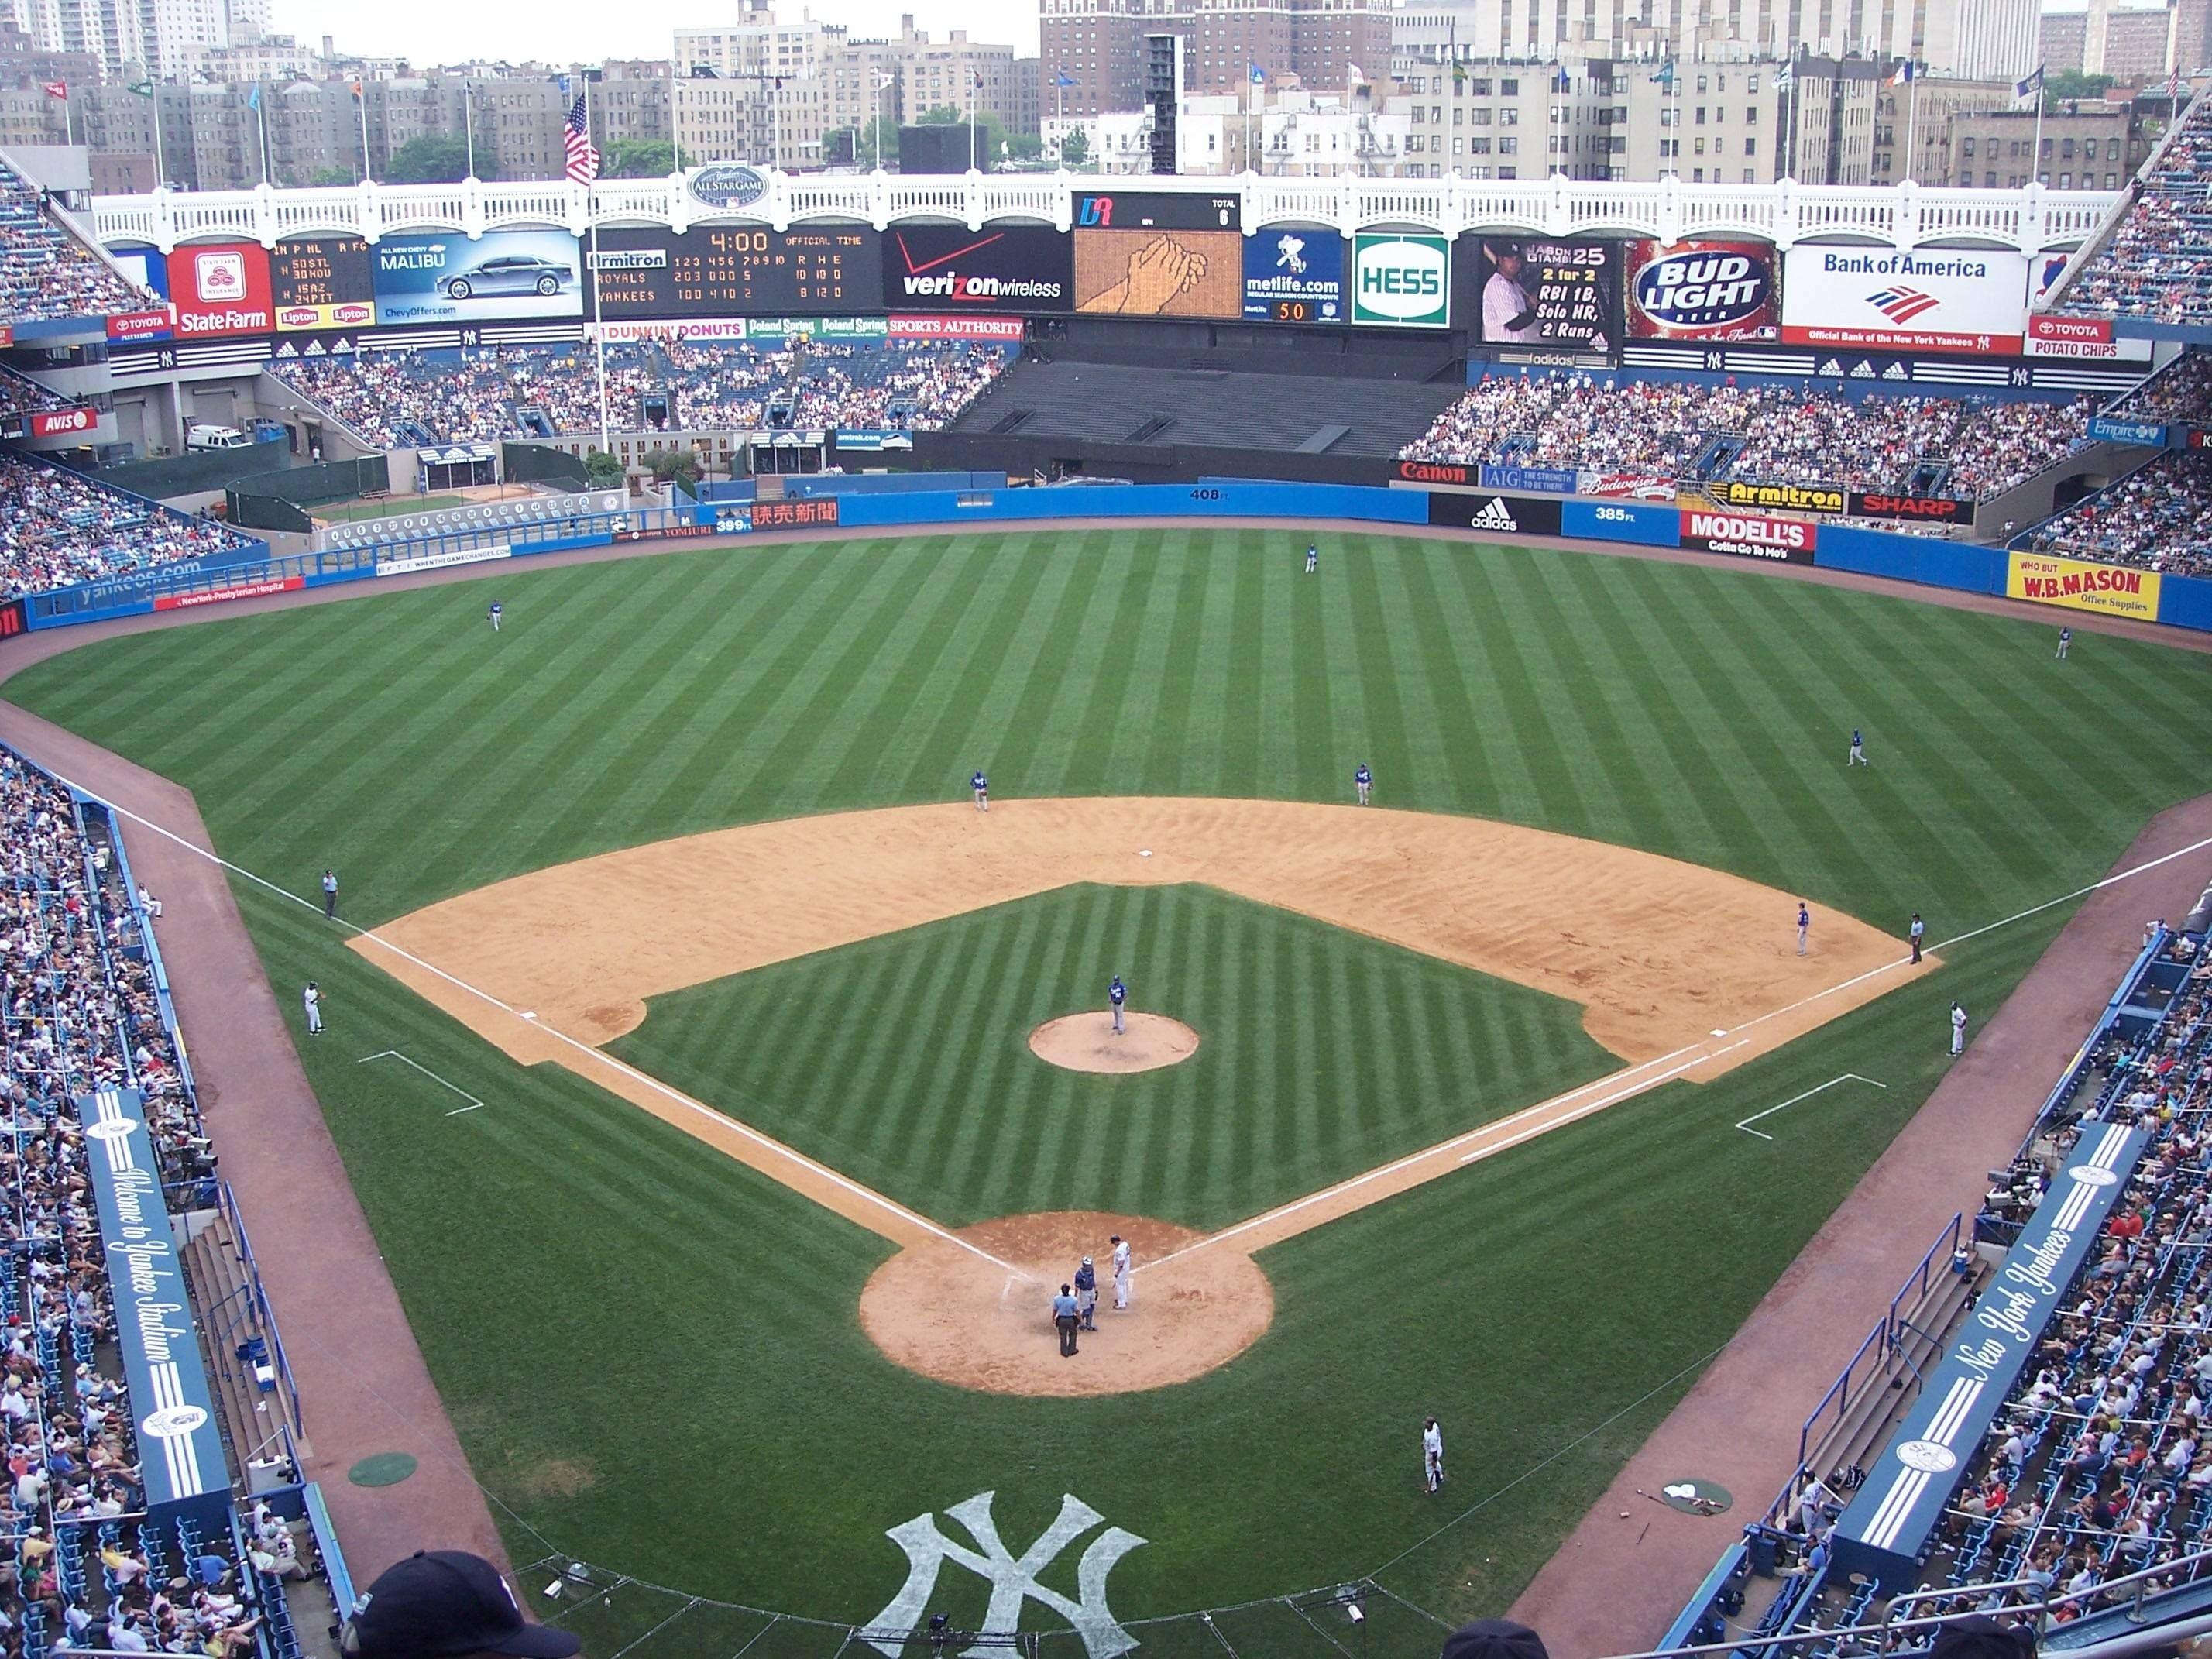 Res: 2856x2142, Yankee Stadium Wallpapers - Wallpaper Cave